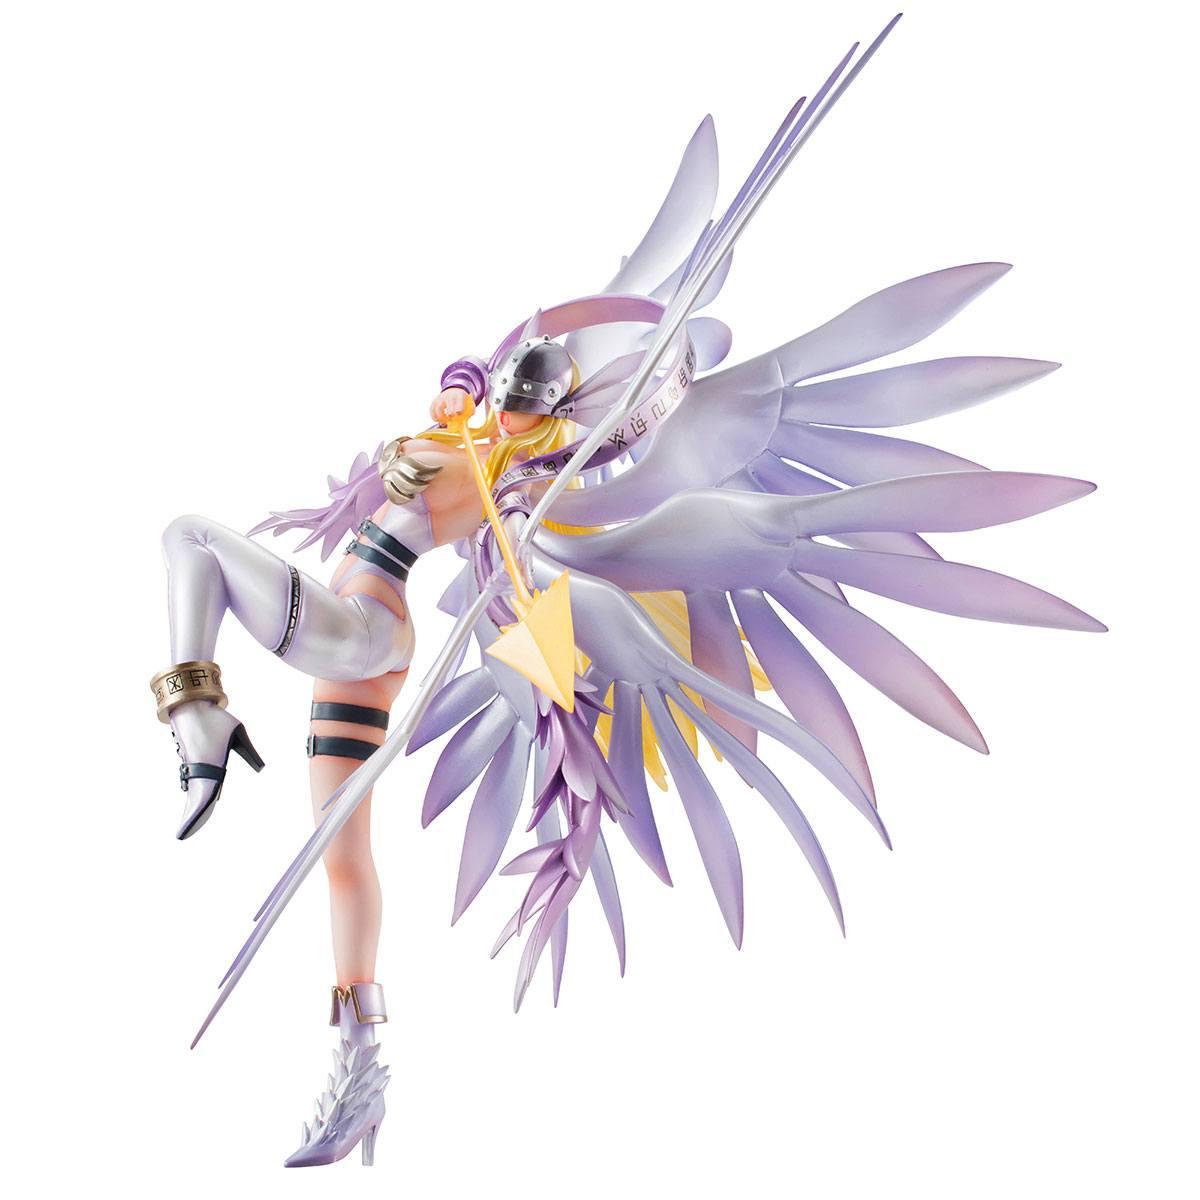 PVC Figure No box Anime GEM Series Digimon Adventure Angewomon Holy Arrow Ver